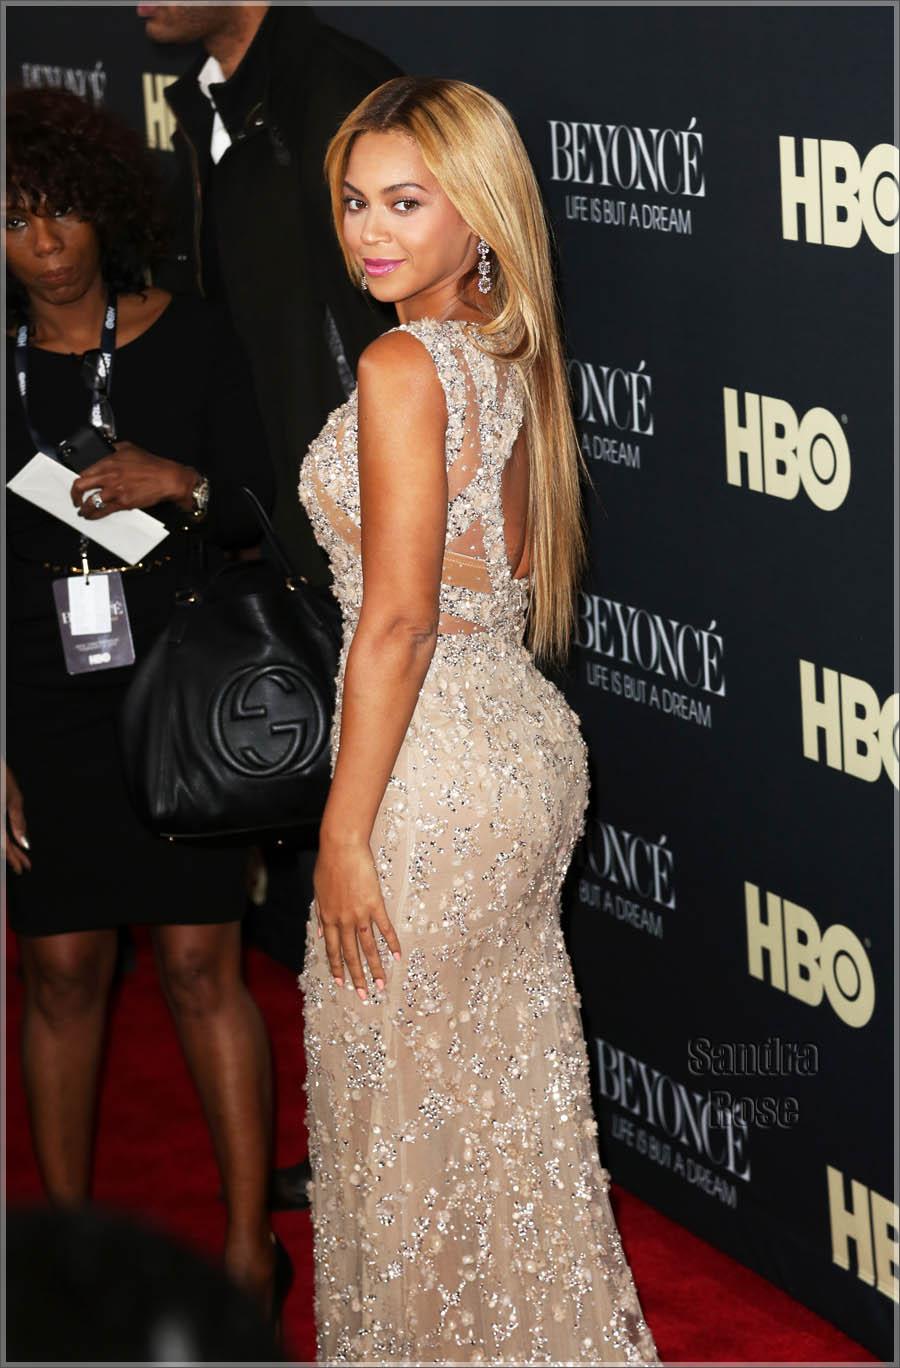 Beyonce booty 2013